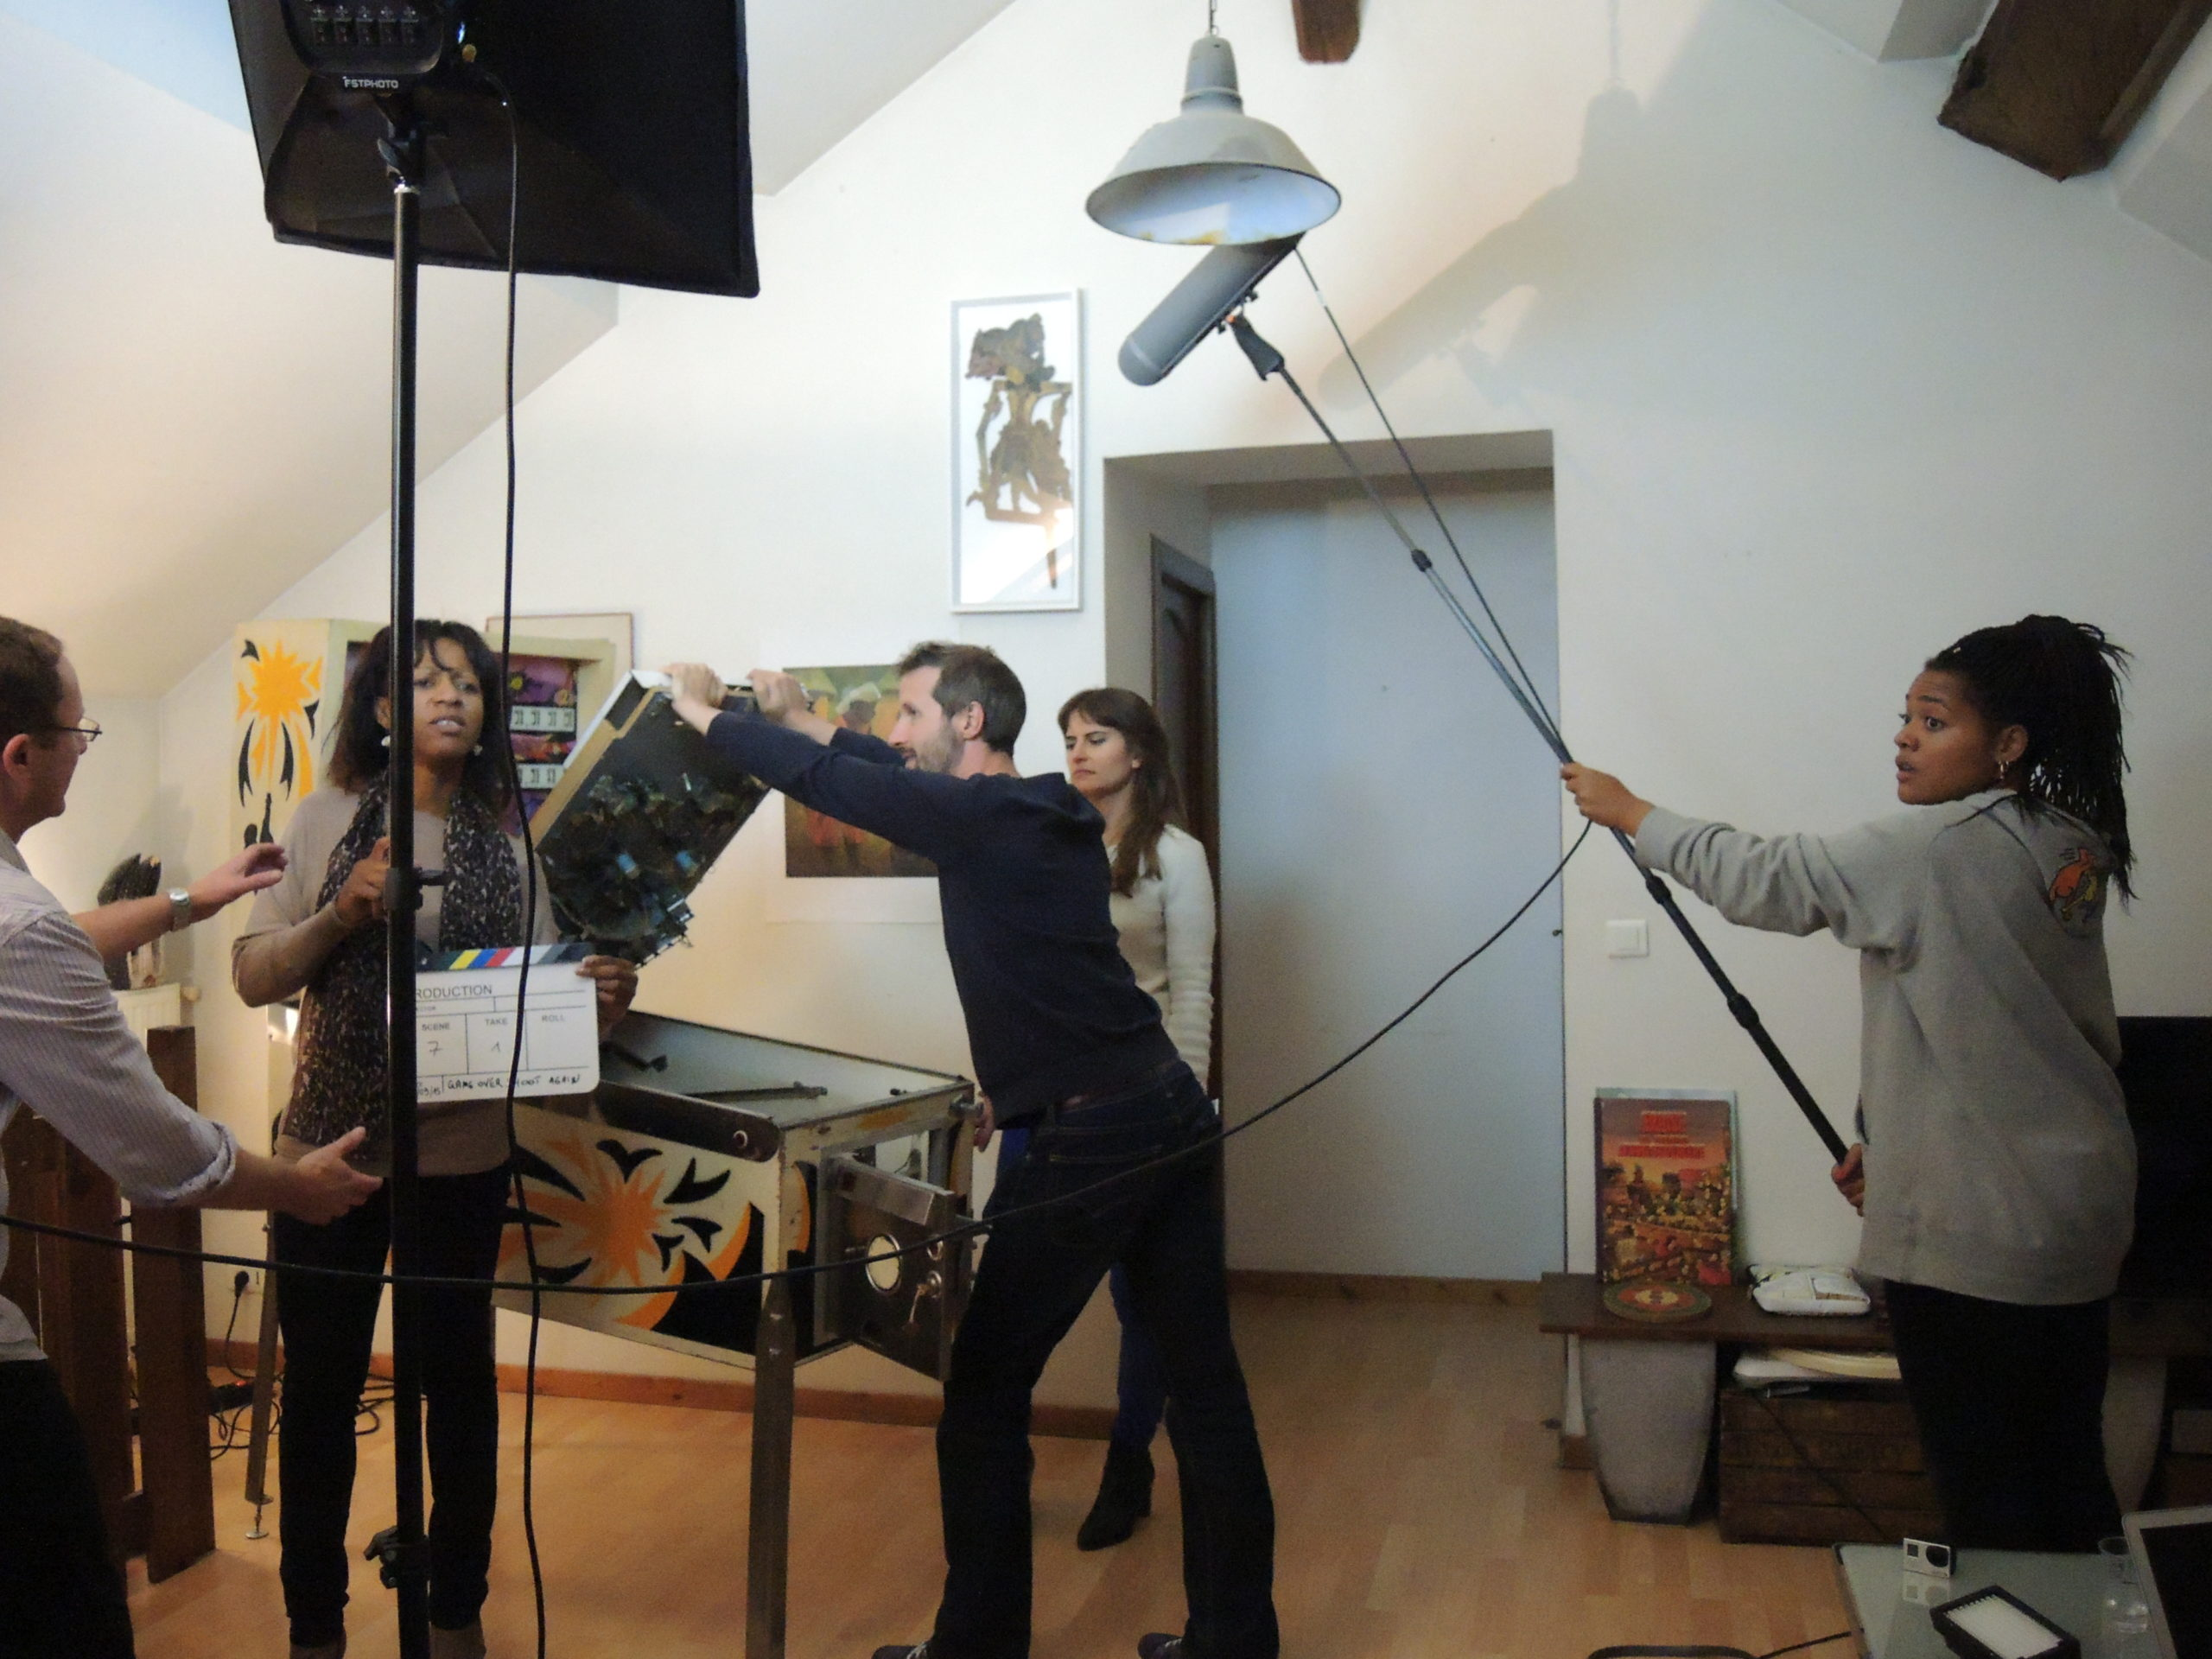 Game over photos tournage 45